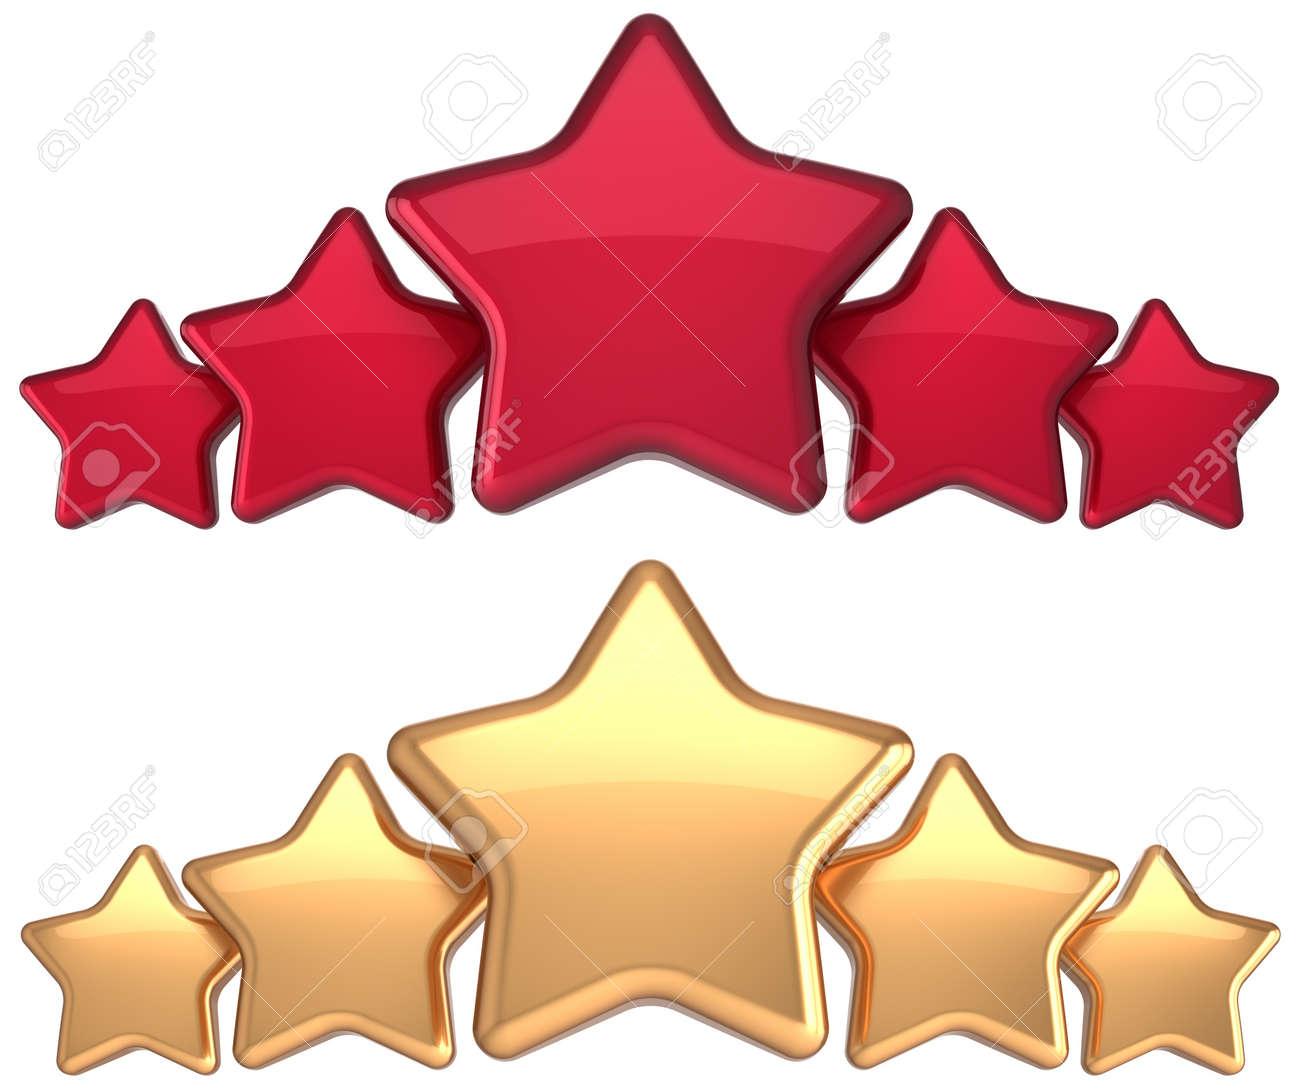 five star service gold red golden award success decoration abstract rh 123rf com gold star clip art download Gold Star Border Clip Art